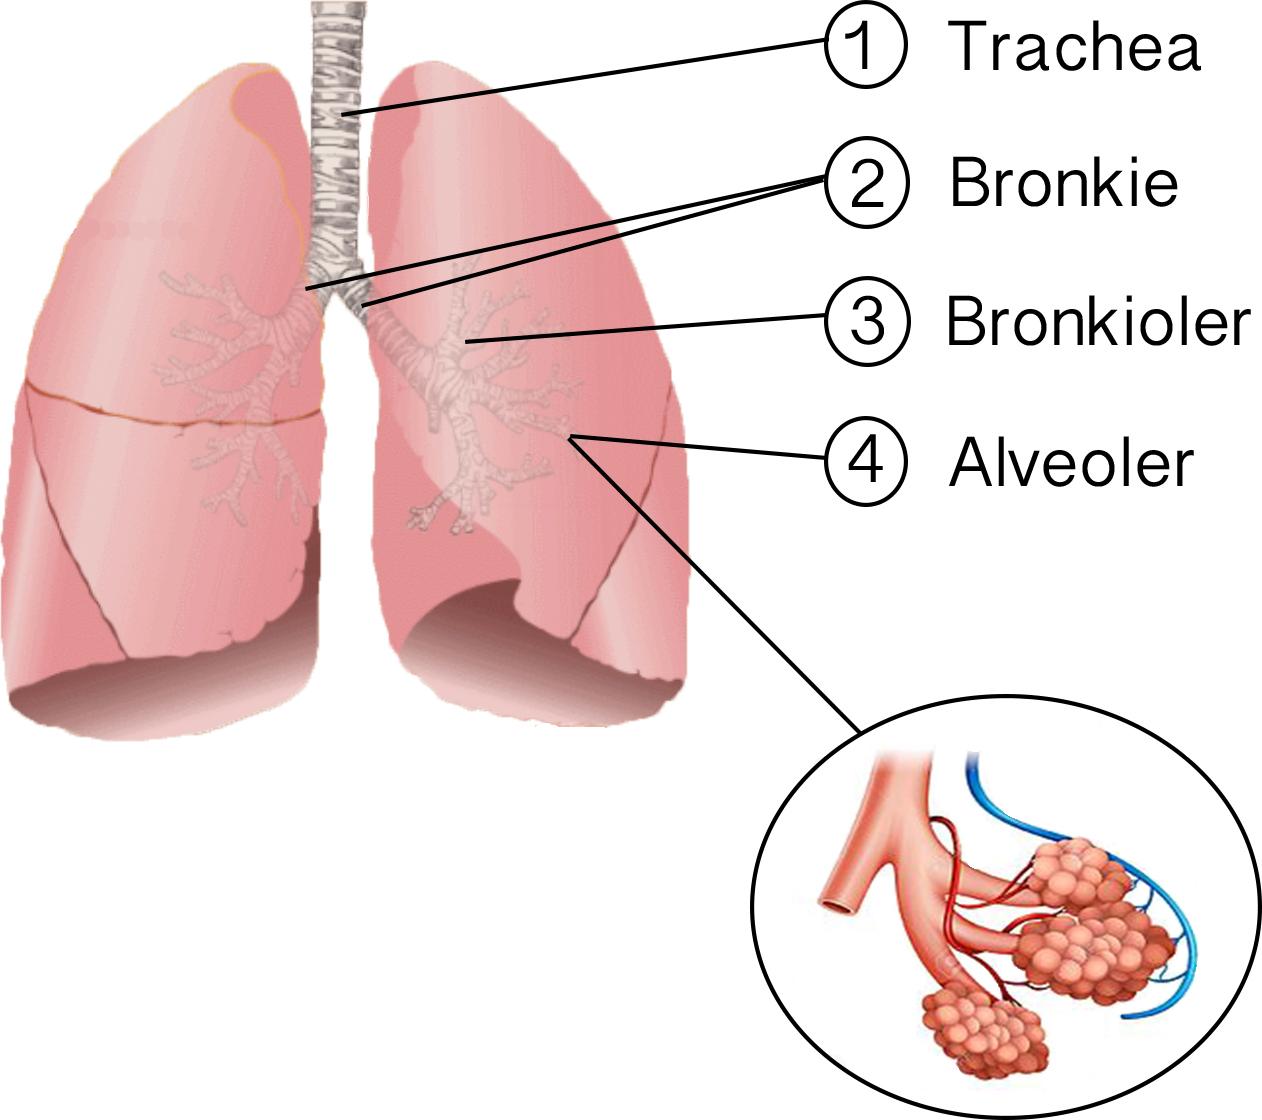 trachea-bronkie-bronkioler-alveoler-kopi